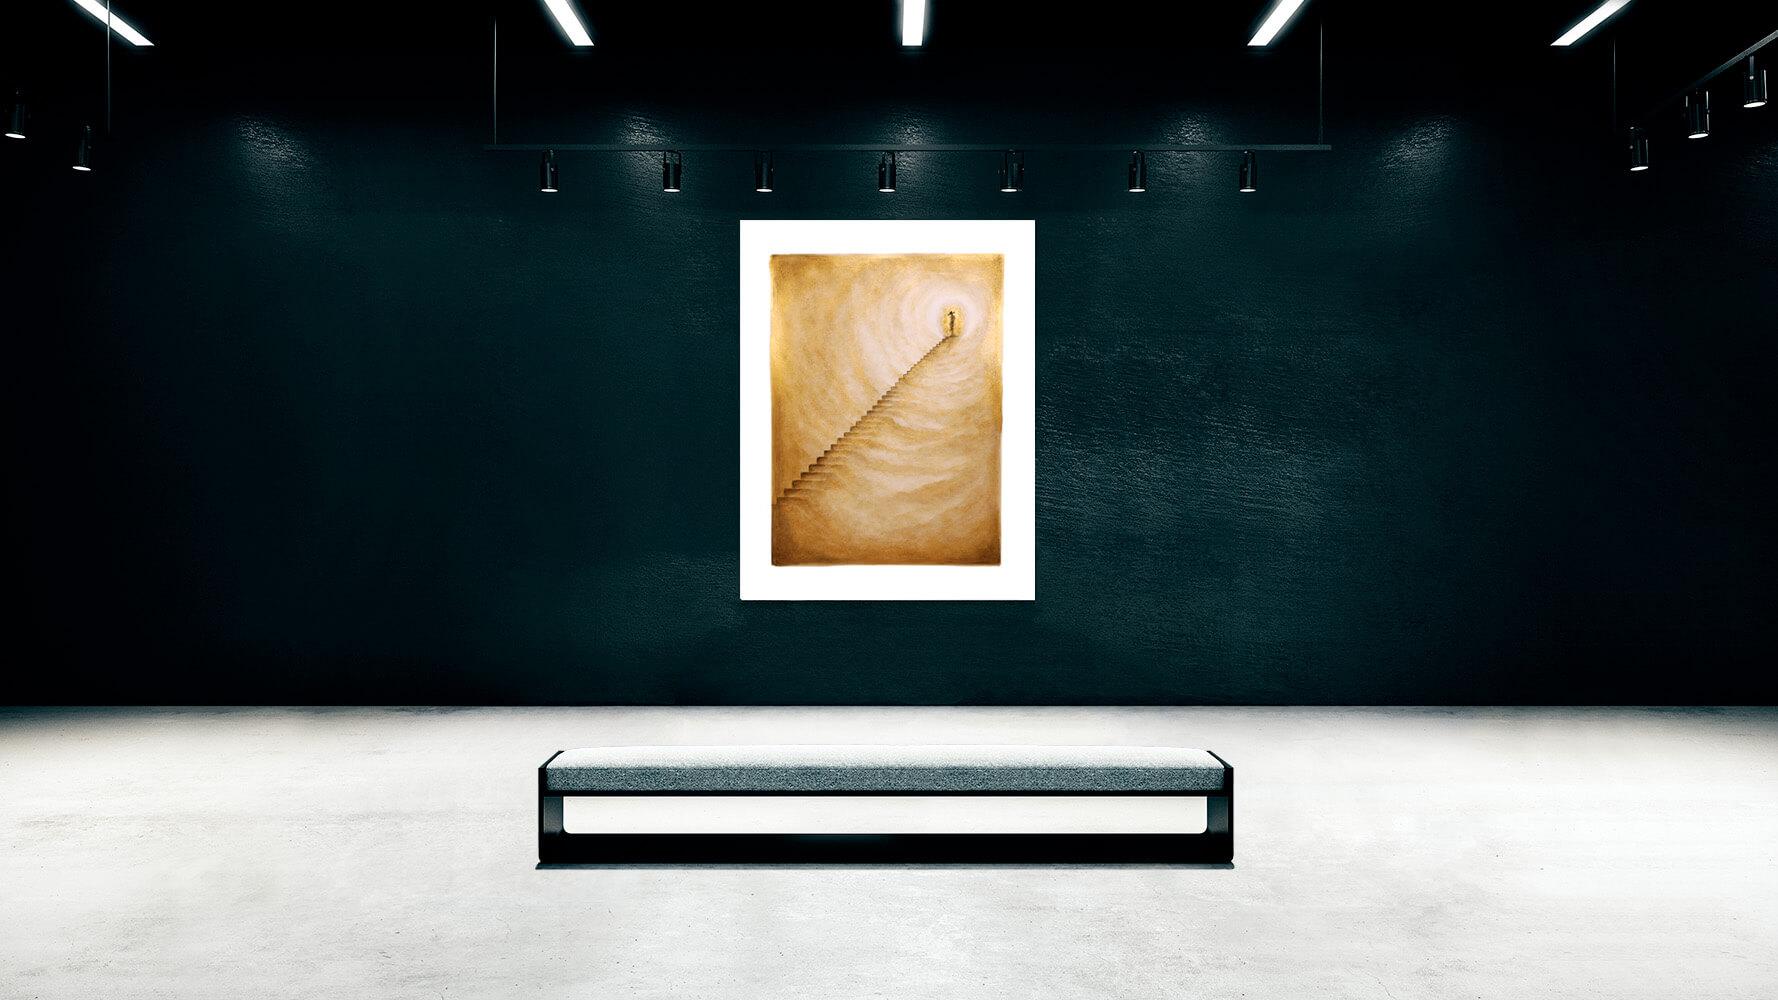 De-peccatis-et-morte-exposicion-colectiva-Horno-Art-Virtual-Gallery-galeria-arte-ilustracion-escultura-decorativa-decoracion-sintora-3